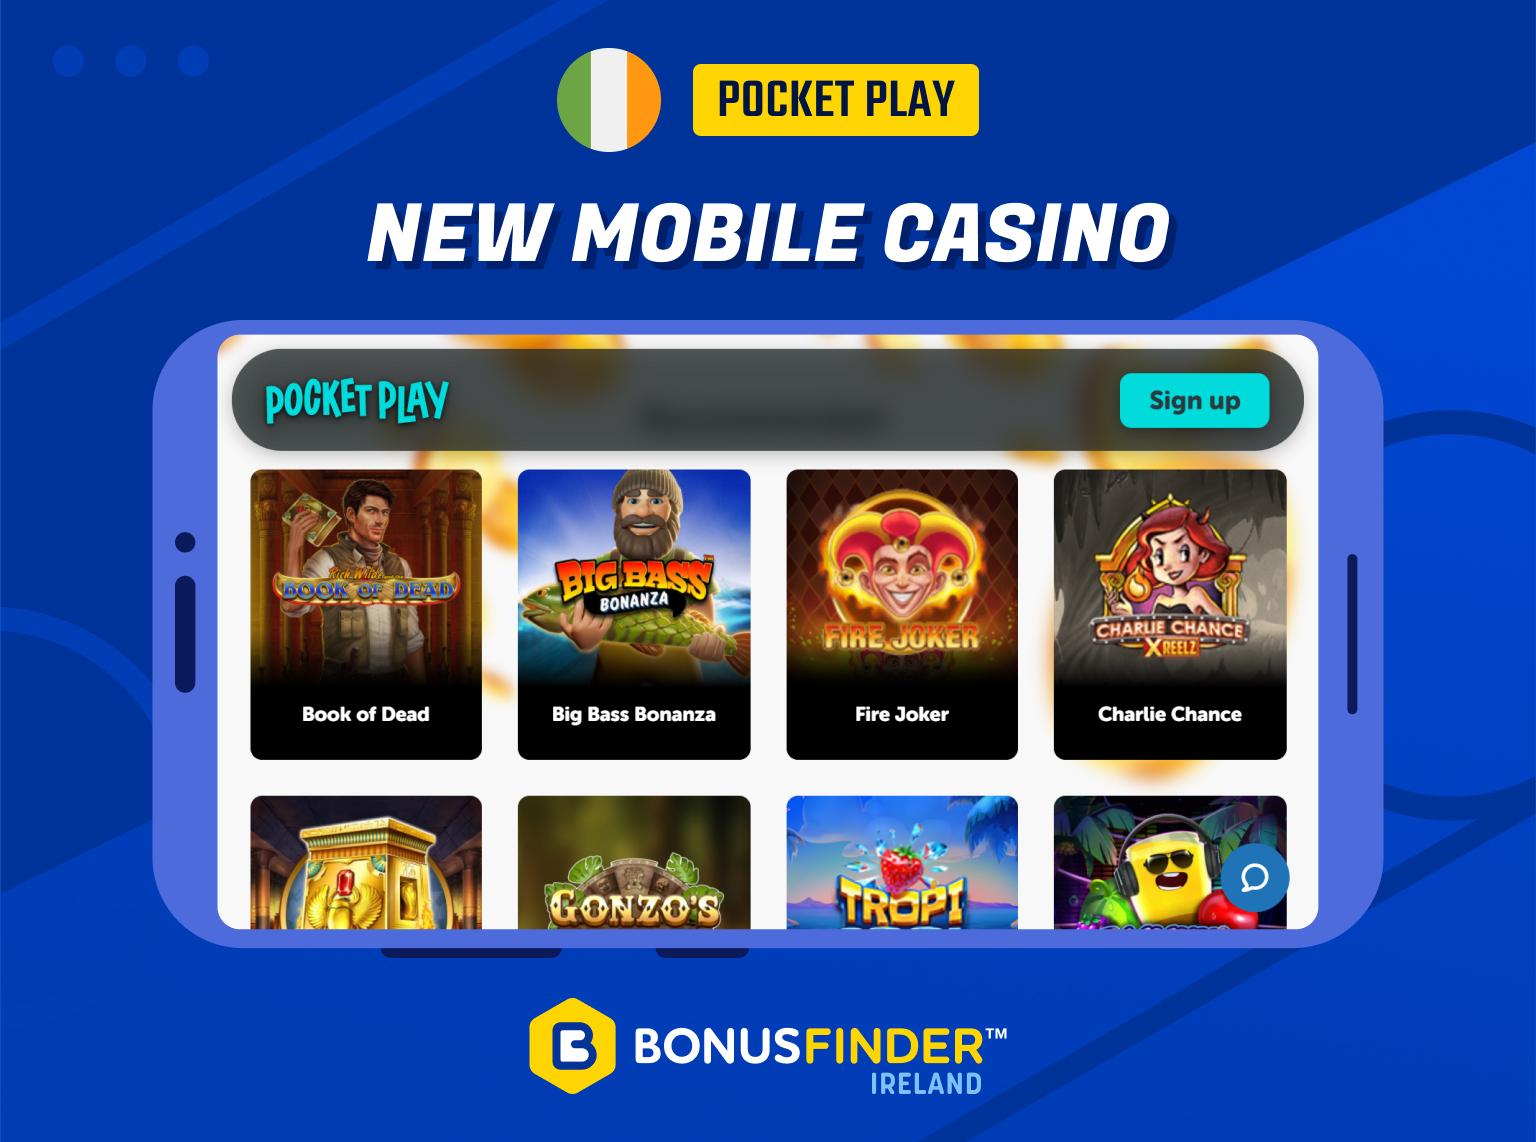 new mobile casinos ireland 2021